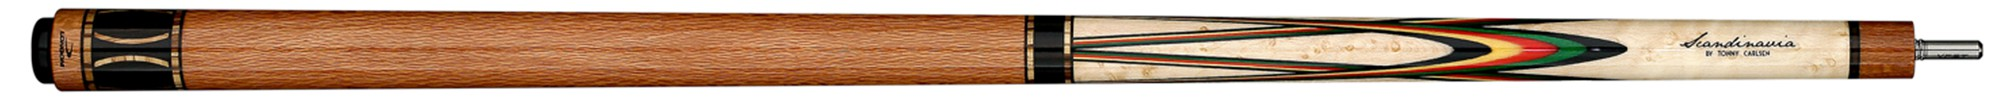 Longoni Scandinavia S30-E71 VP2T - 510 gram